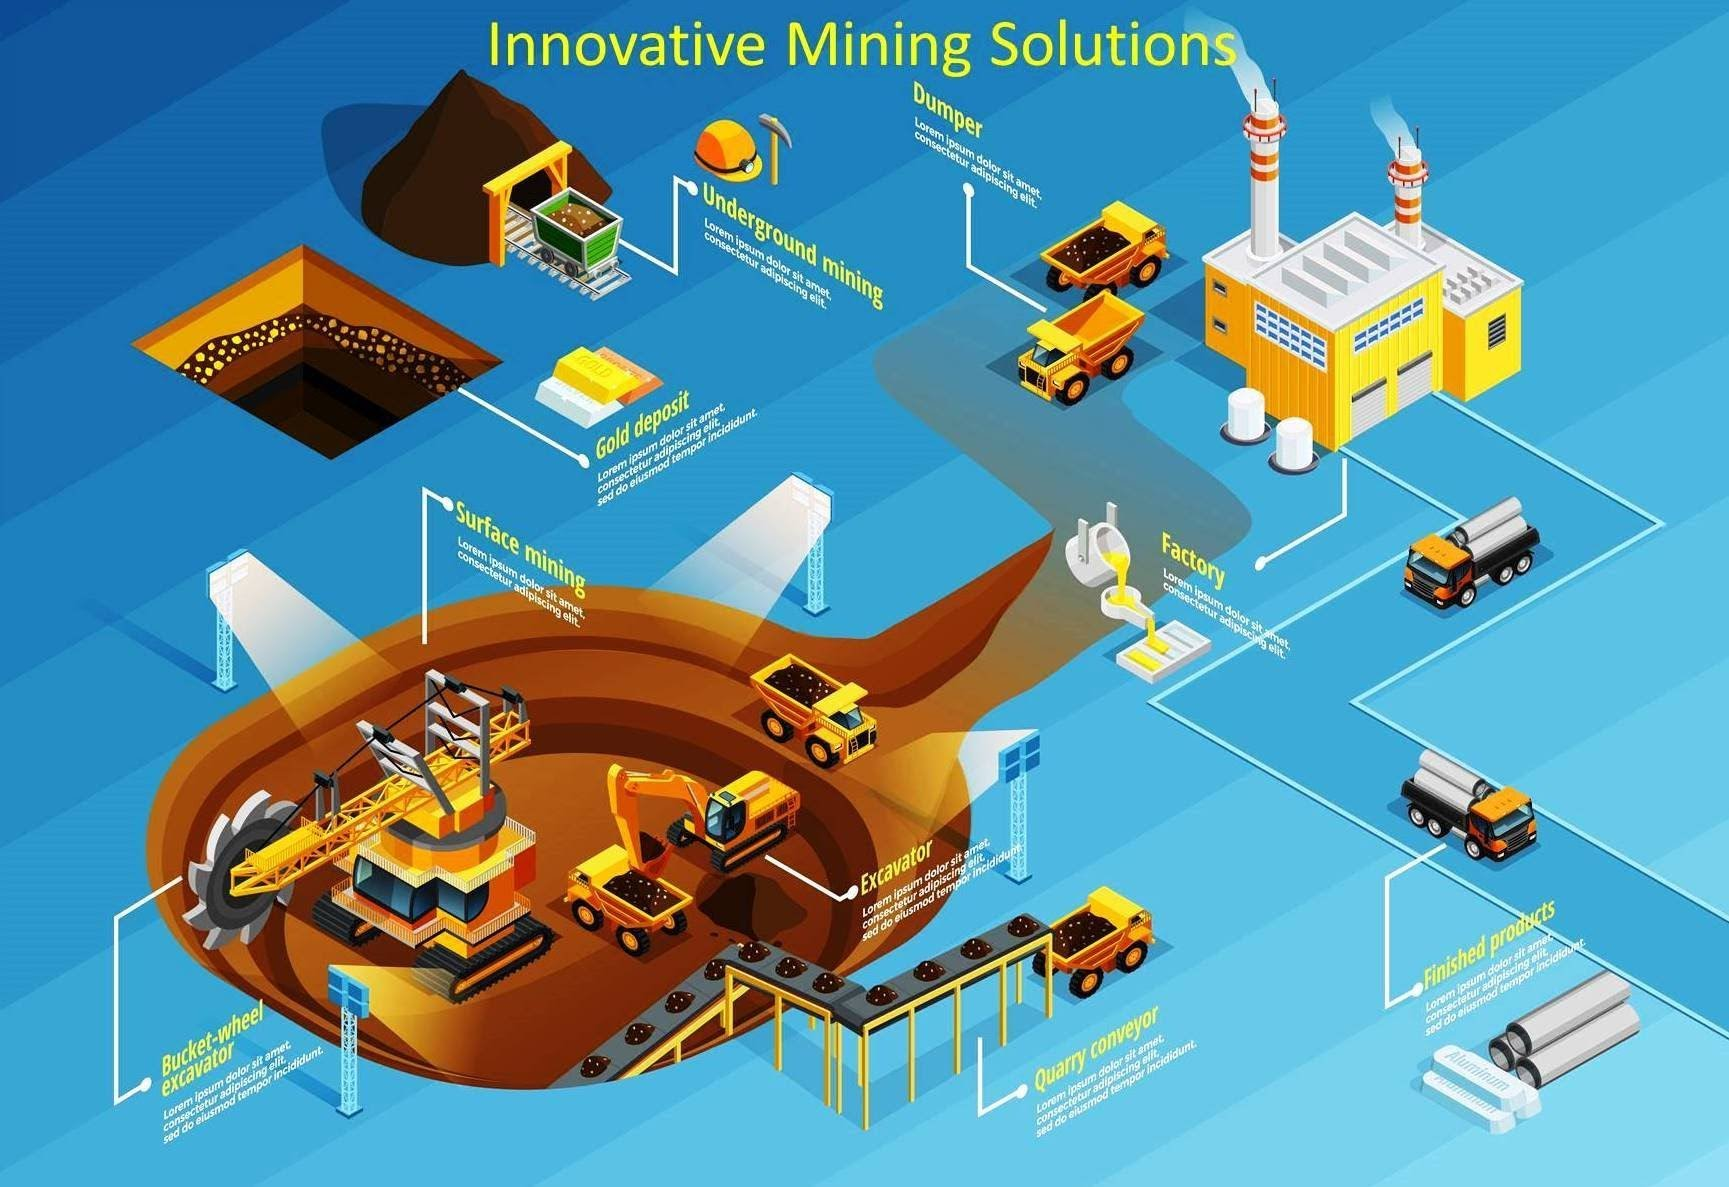 https://www.ge.com/digital/sites/default/files/download_assets/GE-Digital-Mine-Transform-Your-Mine-Into-A-Digital-Industrial-Company.pdf